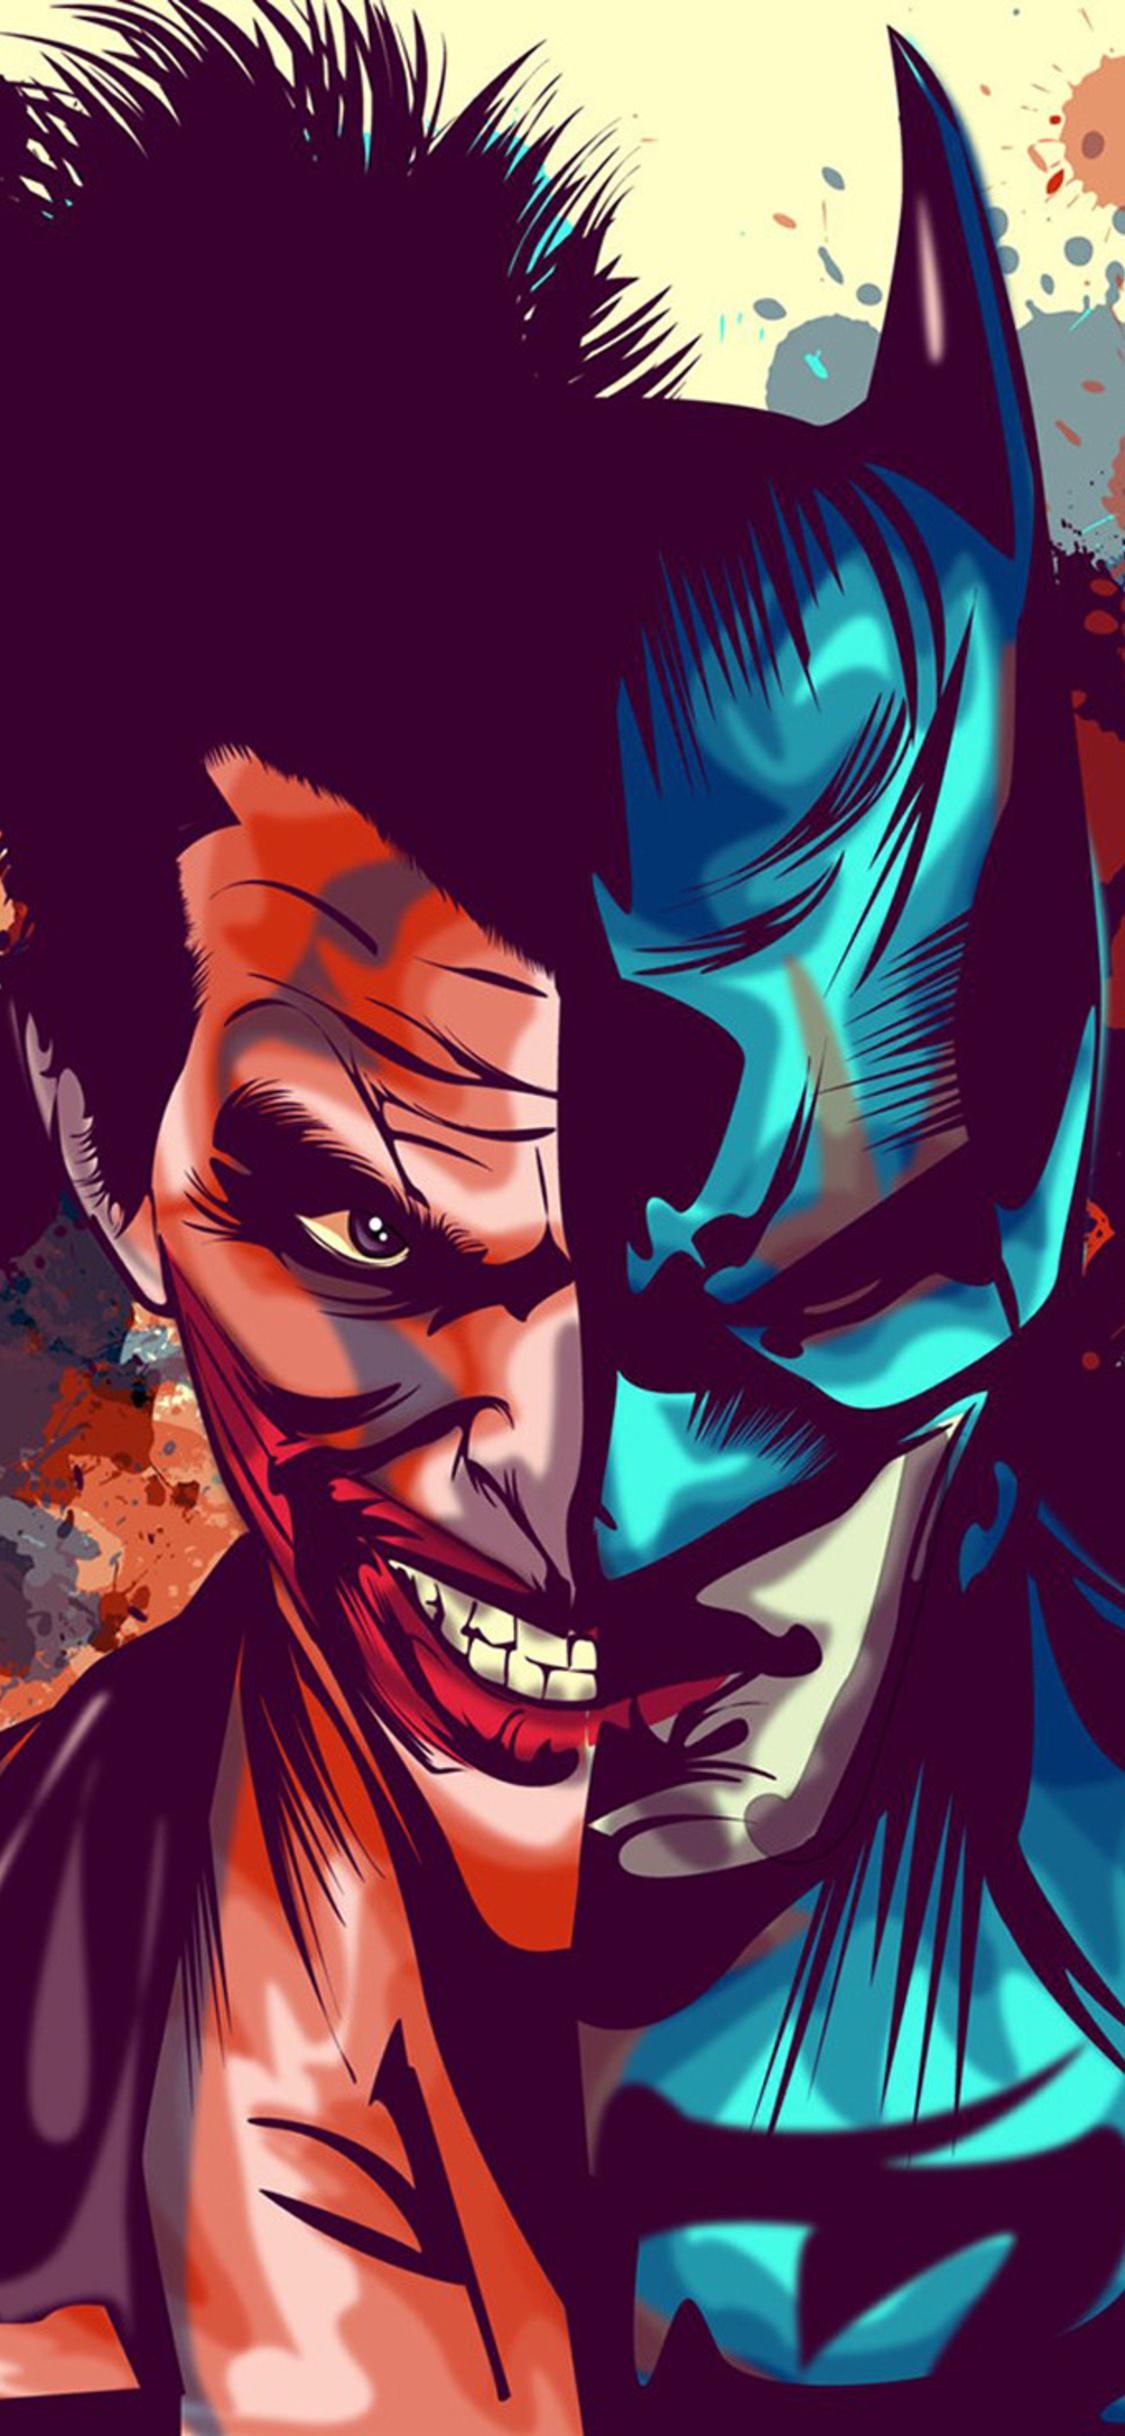 1125x2436 Joker And Batman Faces Artwork Iphone Xs Iphone 10 Iphone